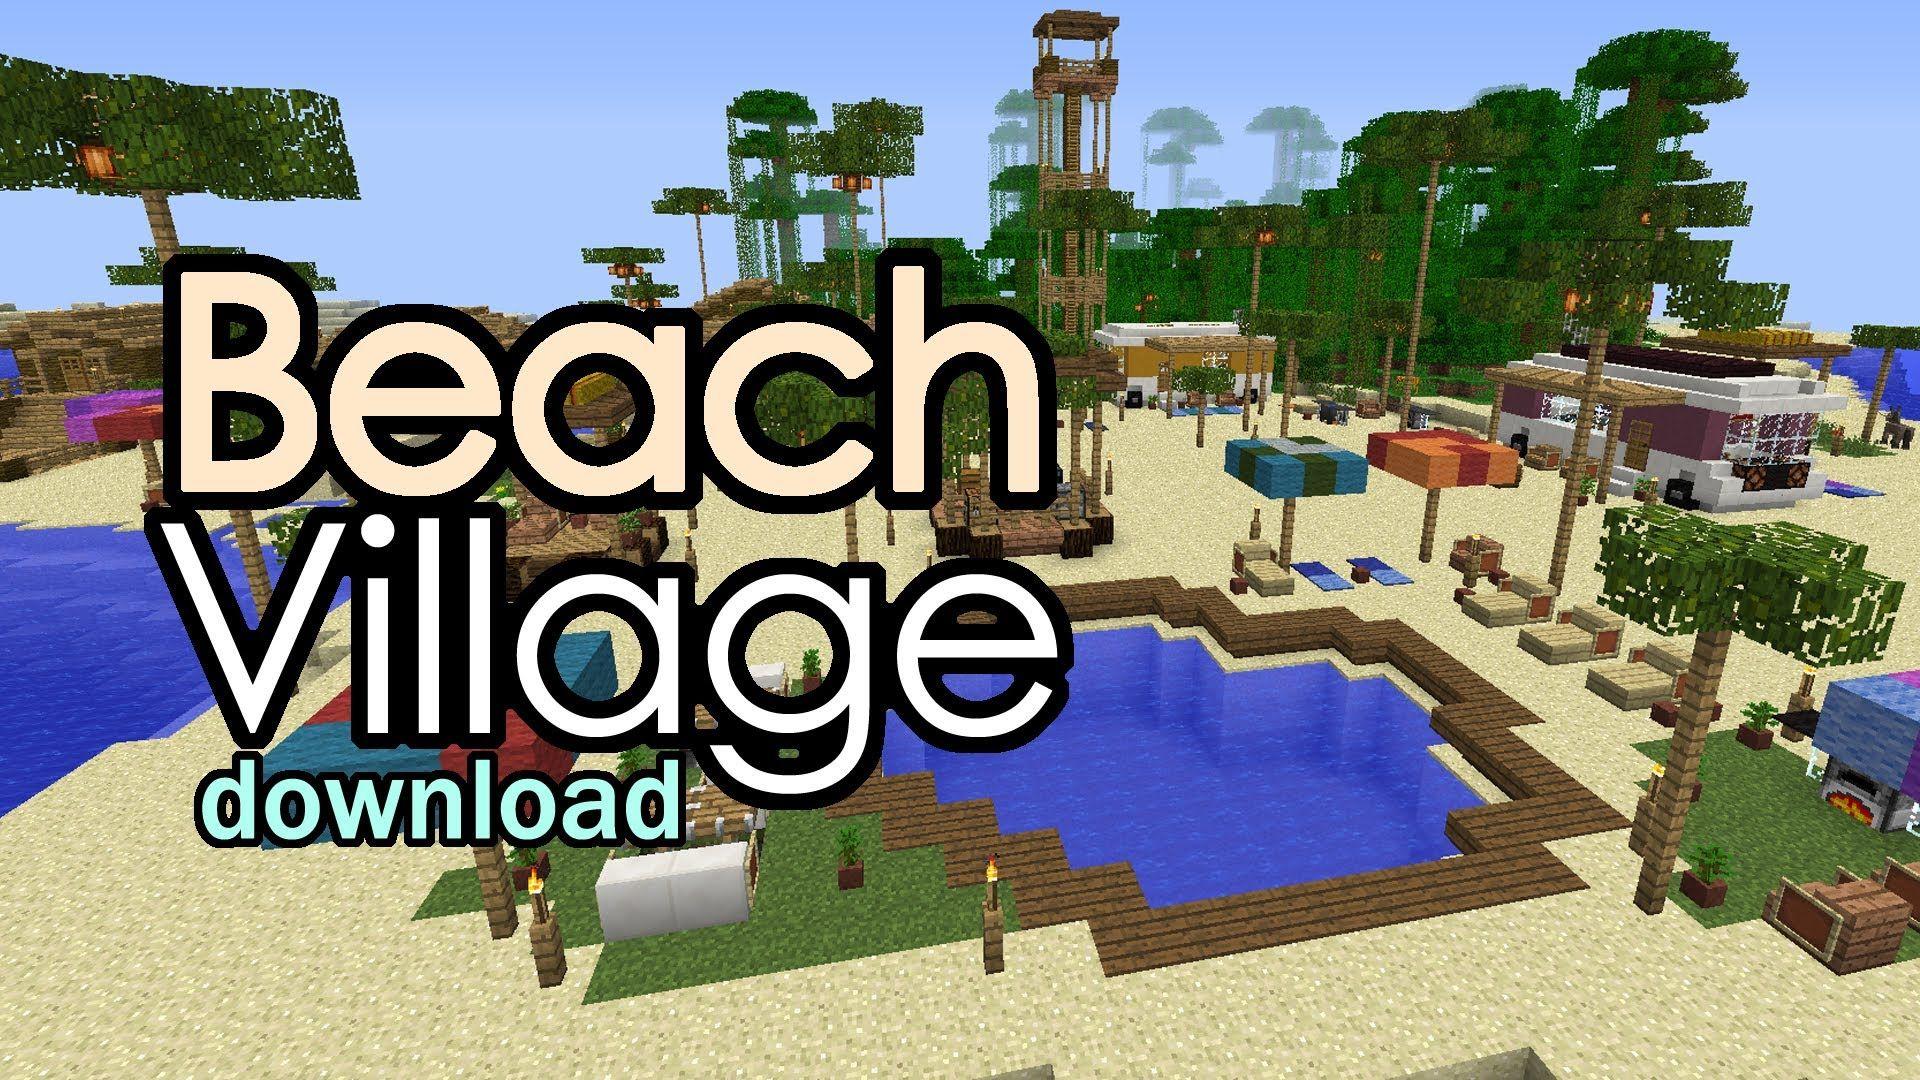 Maxresdefault Jpg 1920 1080 Minecraft Beach House Minecraft